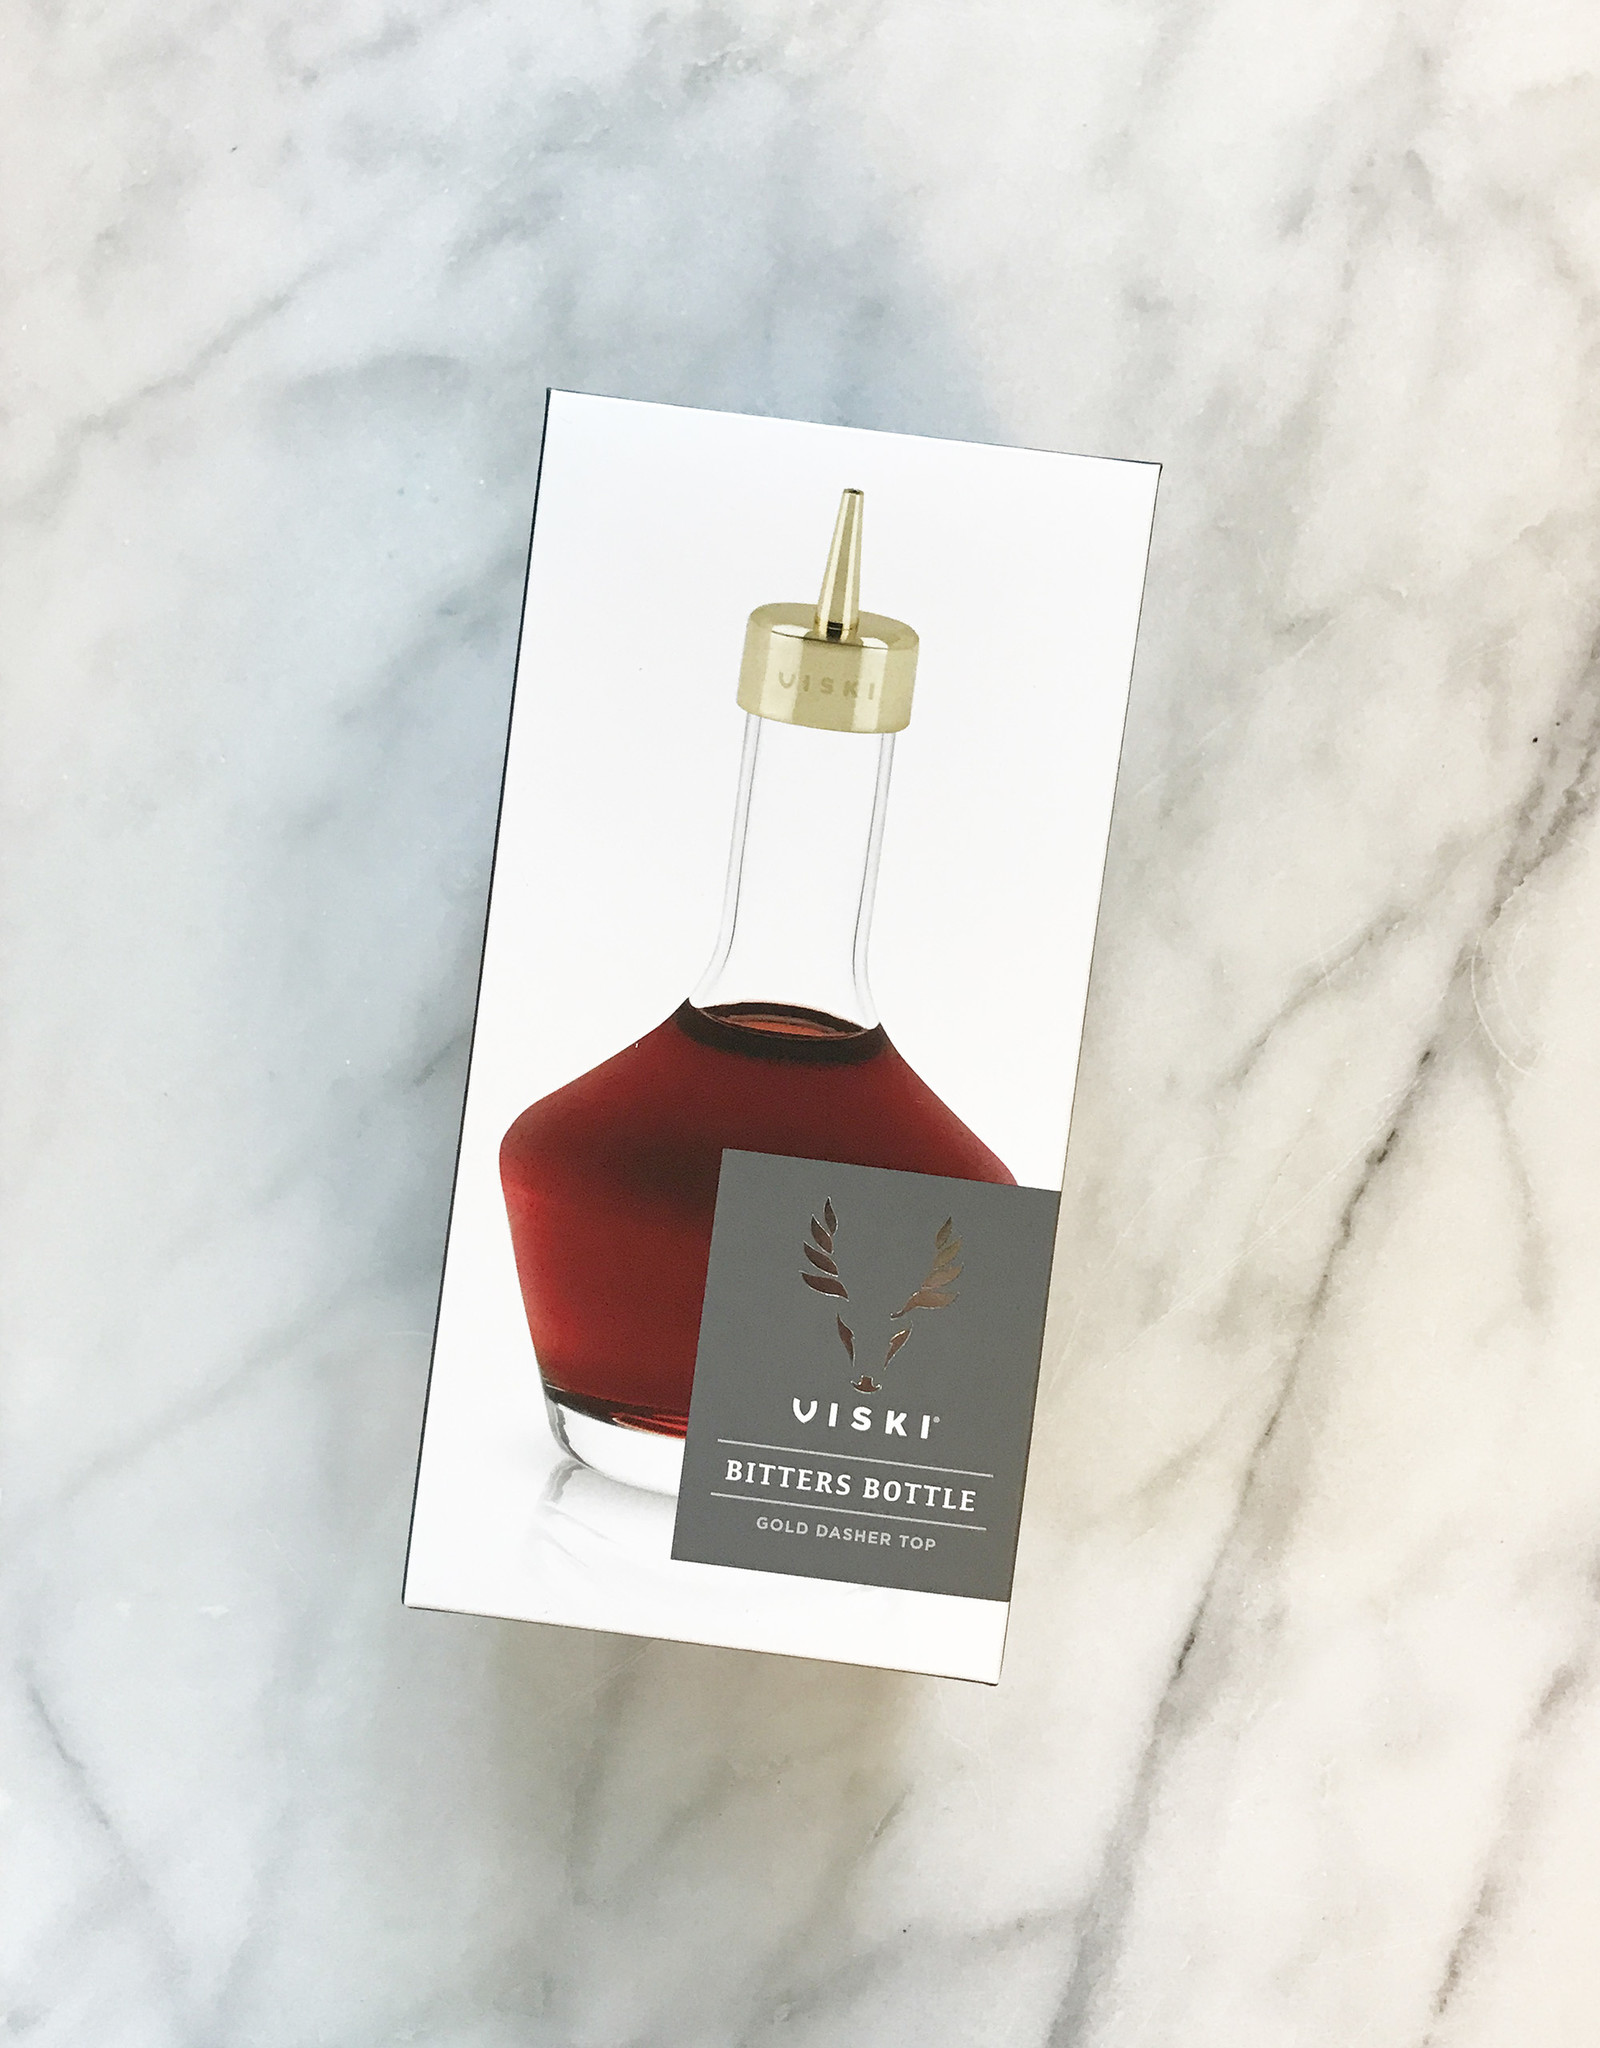 True Brands Viski Bitters Bottle with Gold Dasher Top